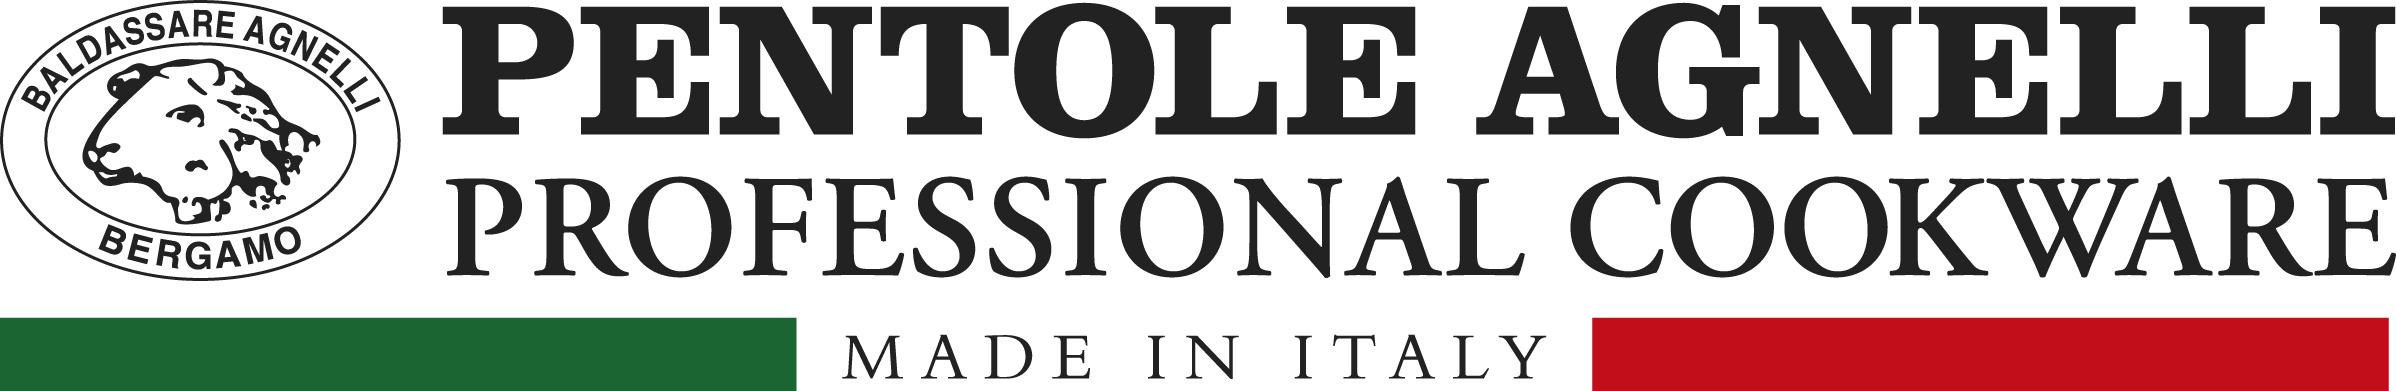 File:Logo Pentole Baldassare Agnelli.jpg - Wikipedia